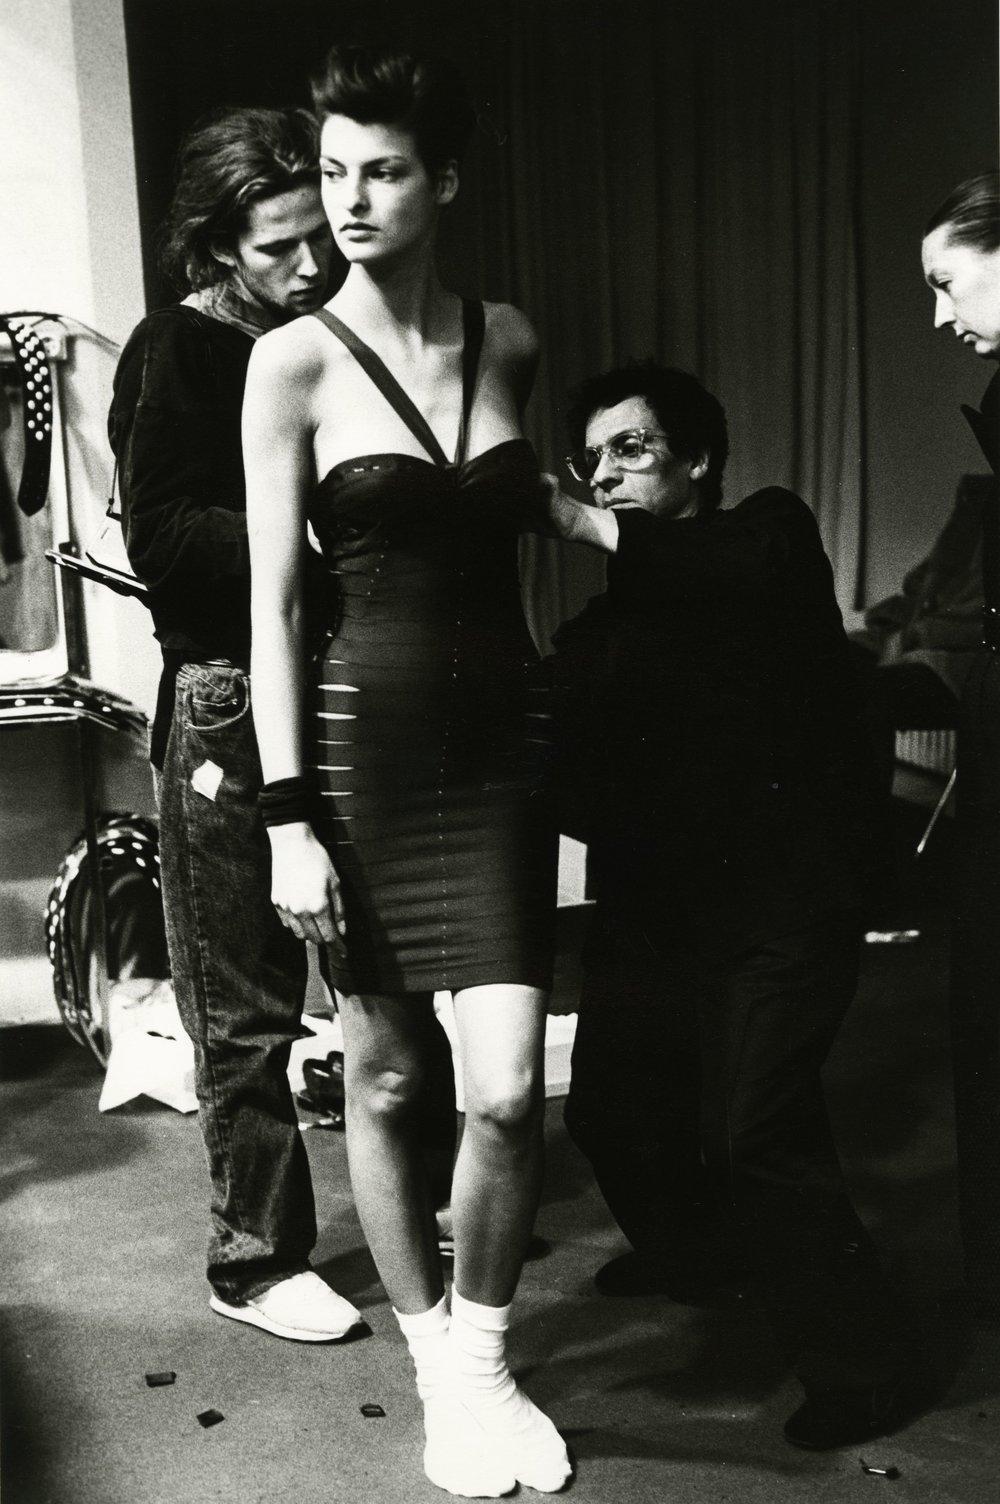 Linda Evangelista and Azzedine Alaïa, 1990. Courtesy of Sante D'Orazio.